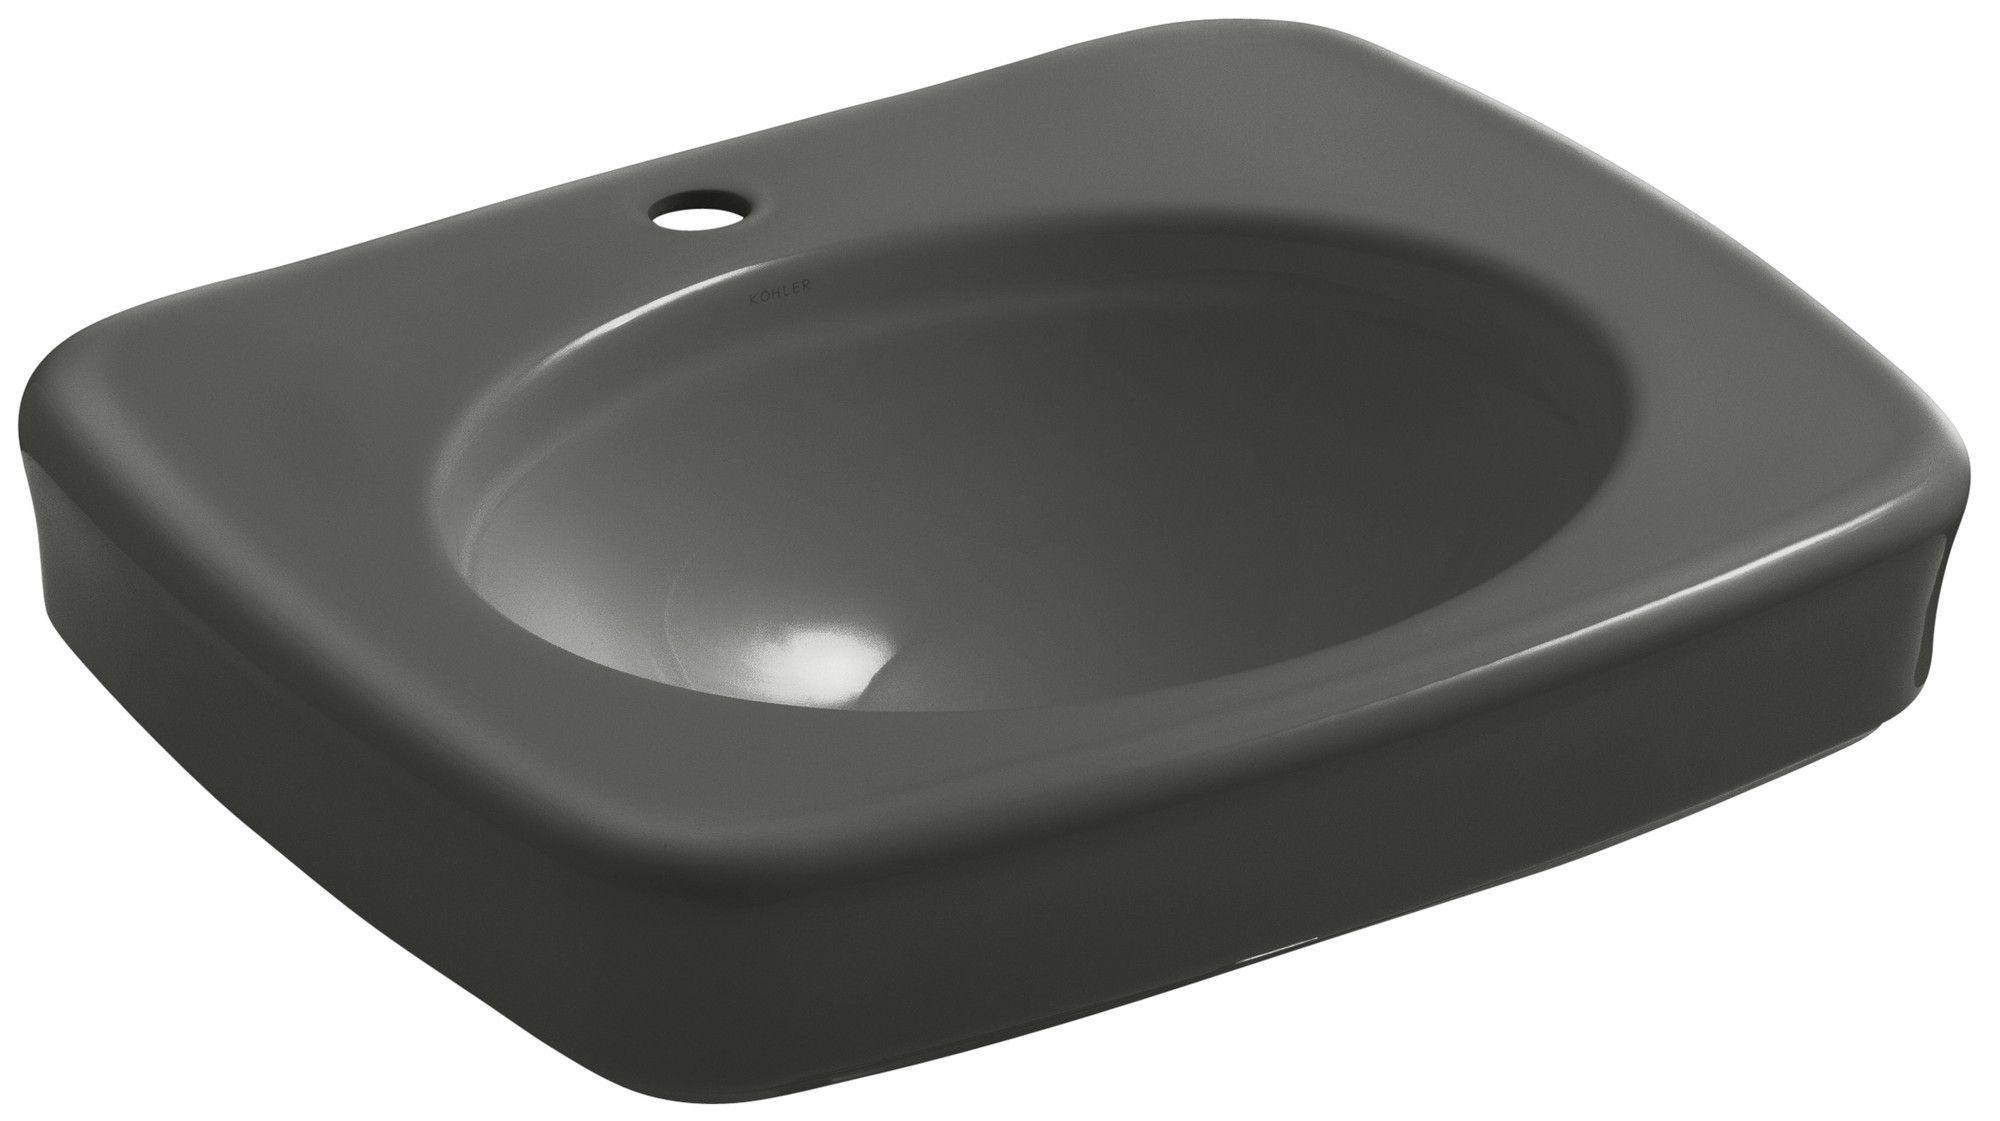 Bancroft Pedestal Bathroom Sink Bowl with Single Faucet Hole